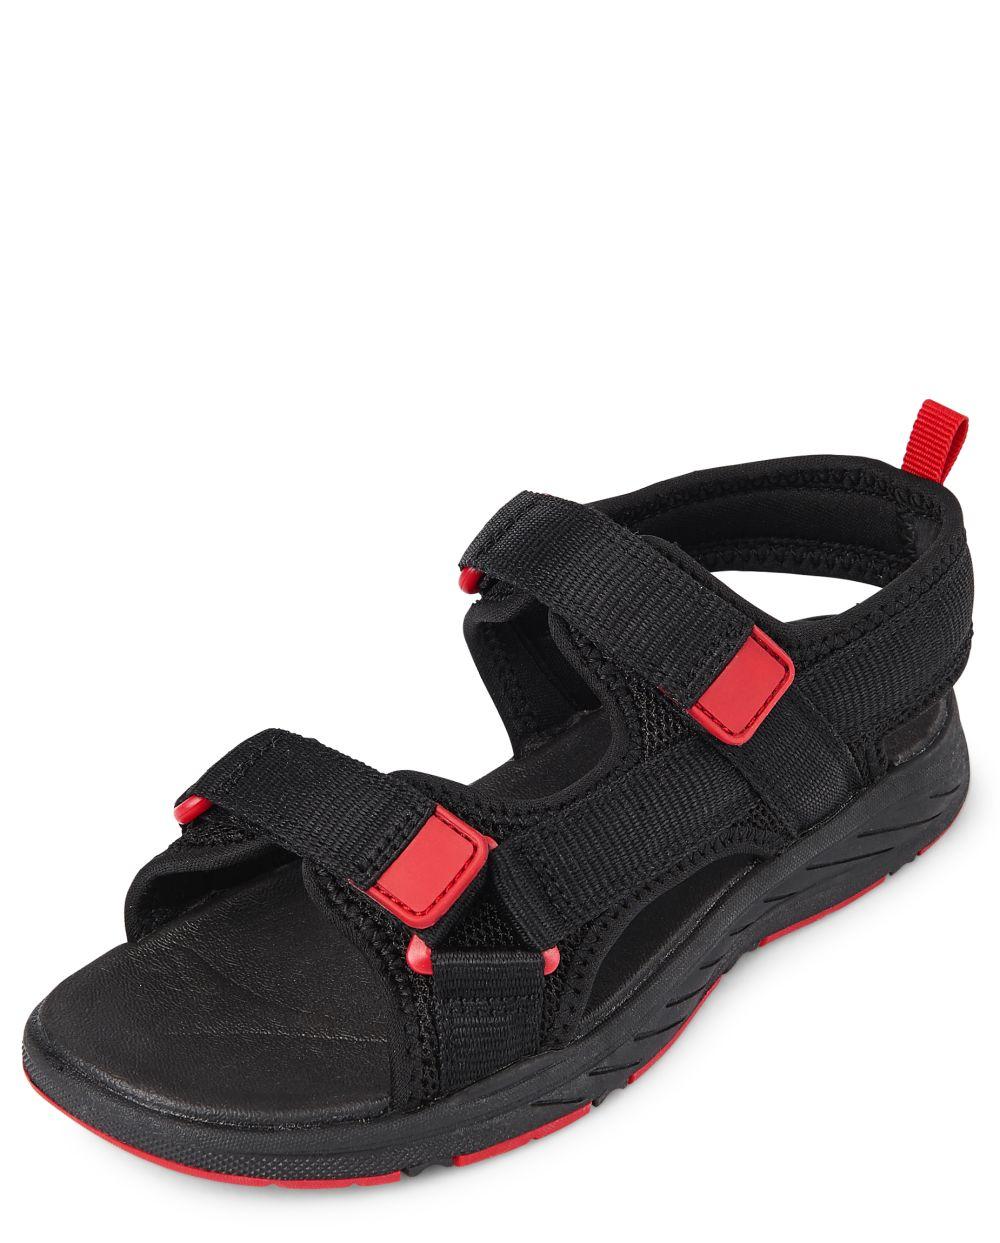 Boys Sport Sandals - Black